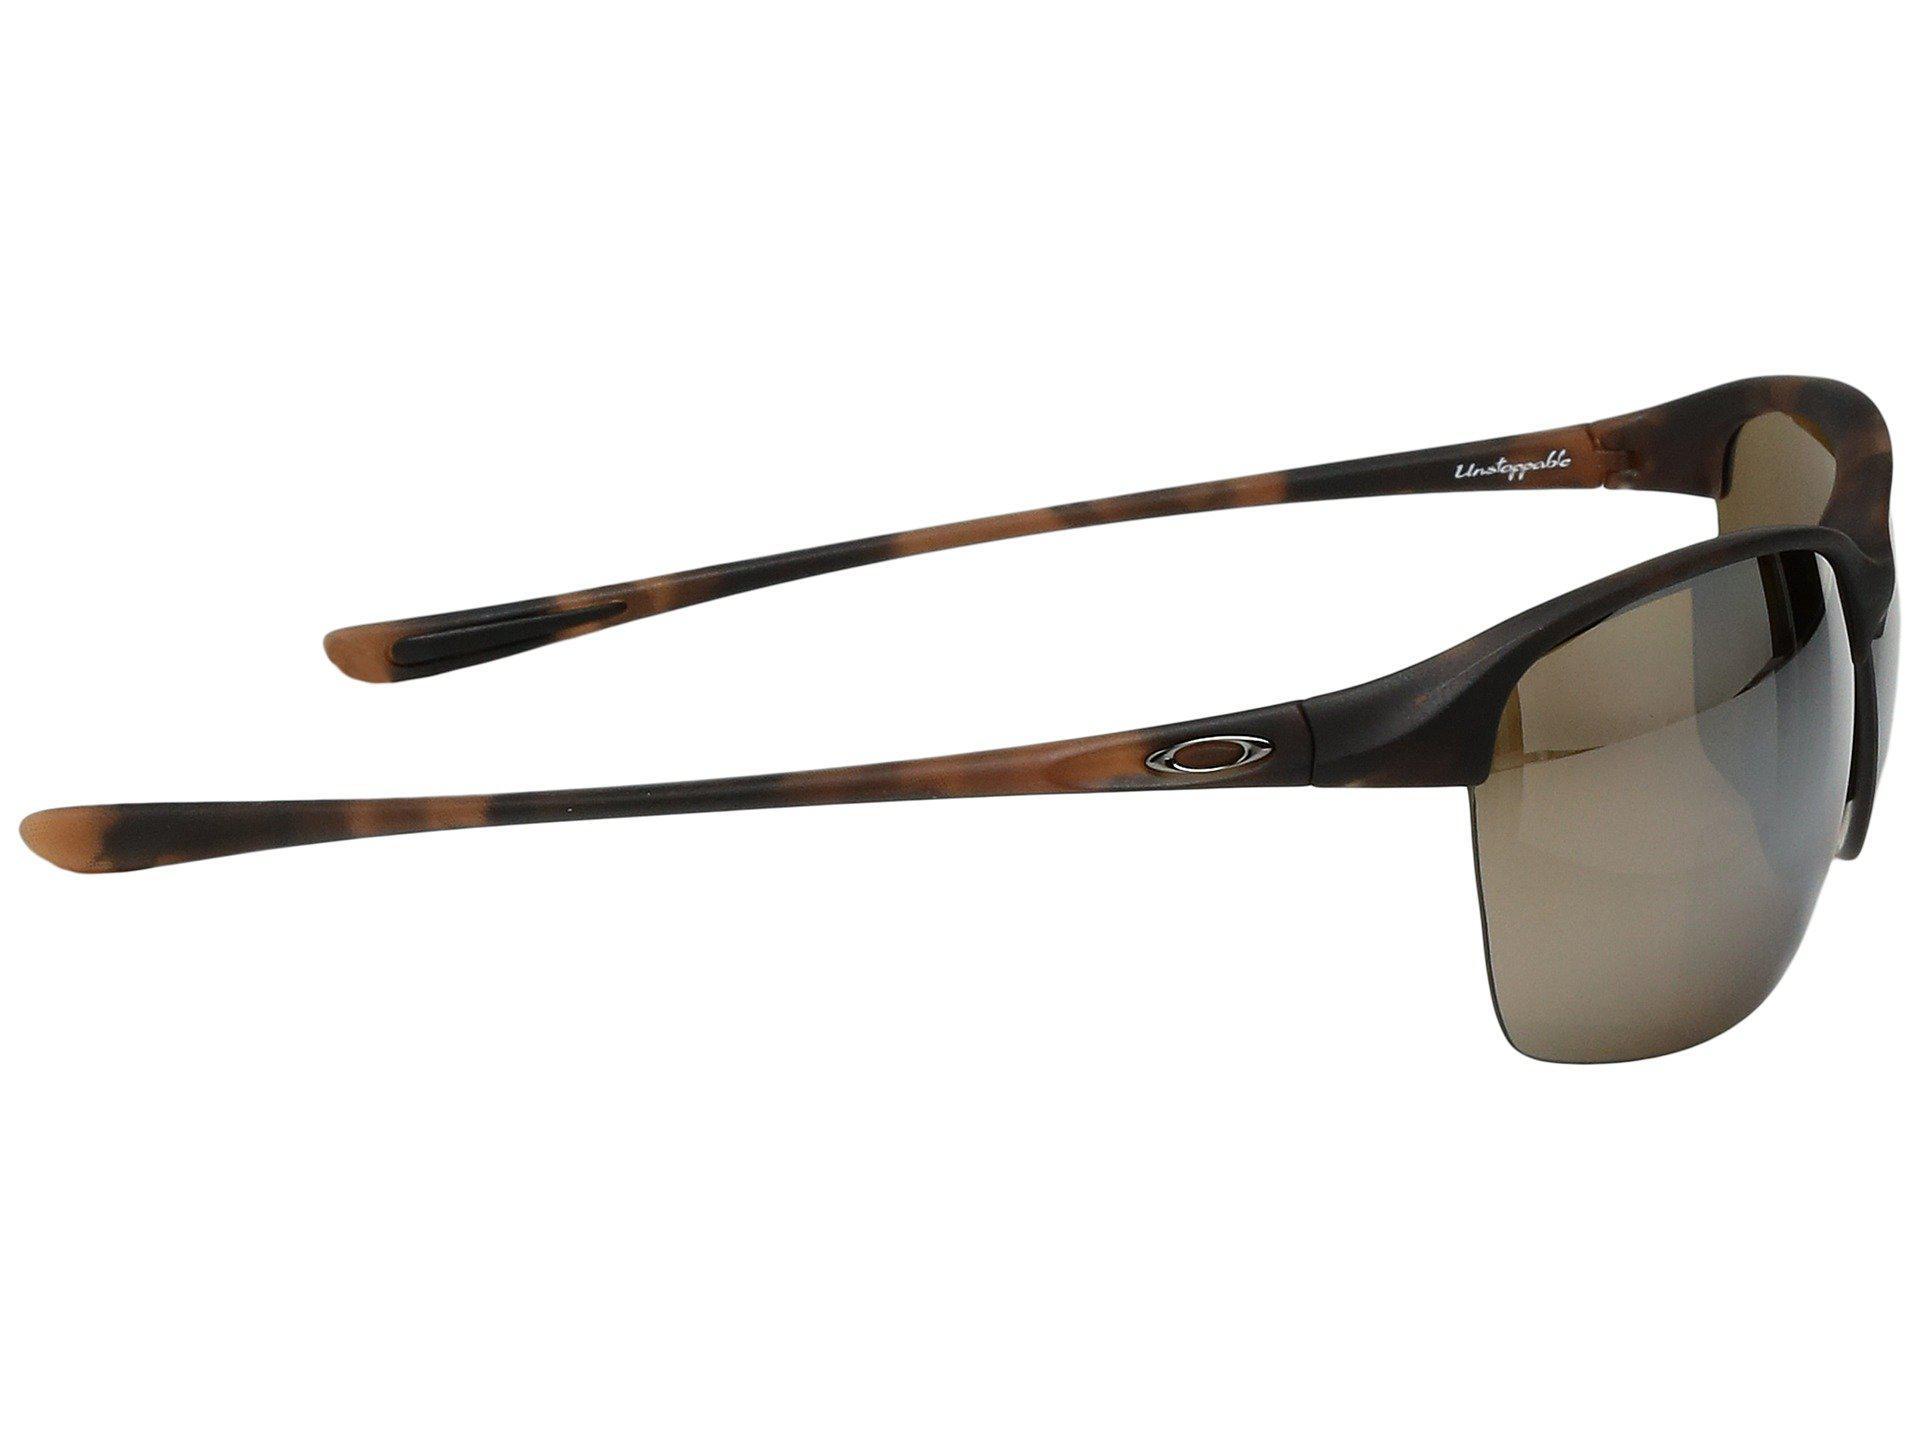 0588d1db56b Oakley - Unstoppable (matte Brown Tortoise W  Prizm Deep Polarized) Fashion  Sunglasses -. View fullscreen